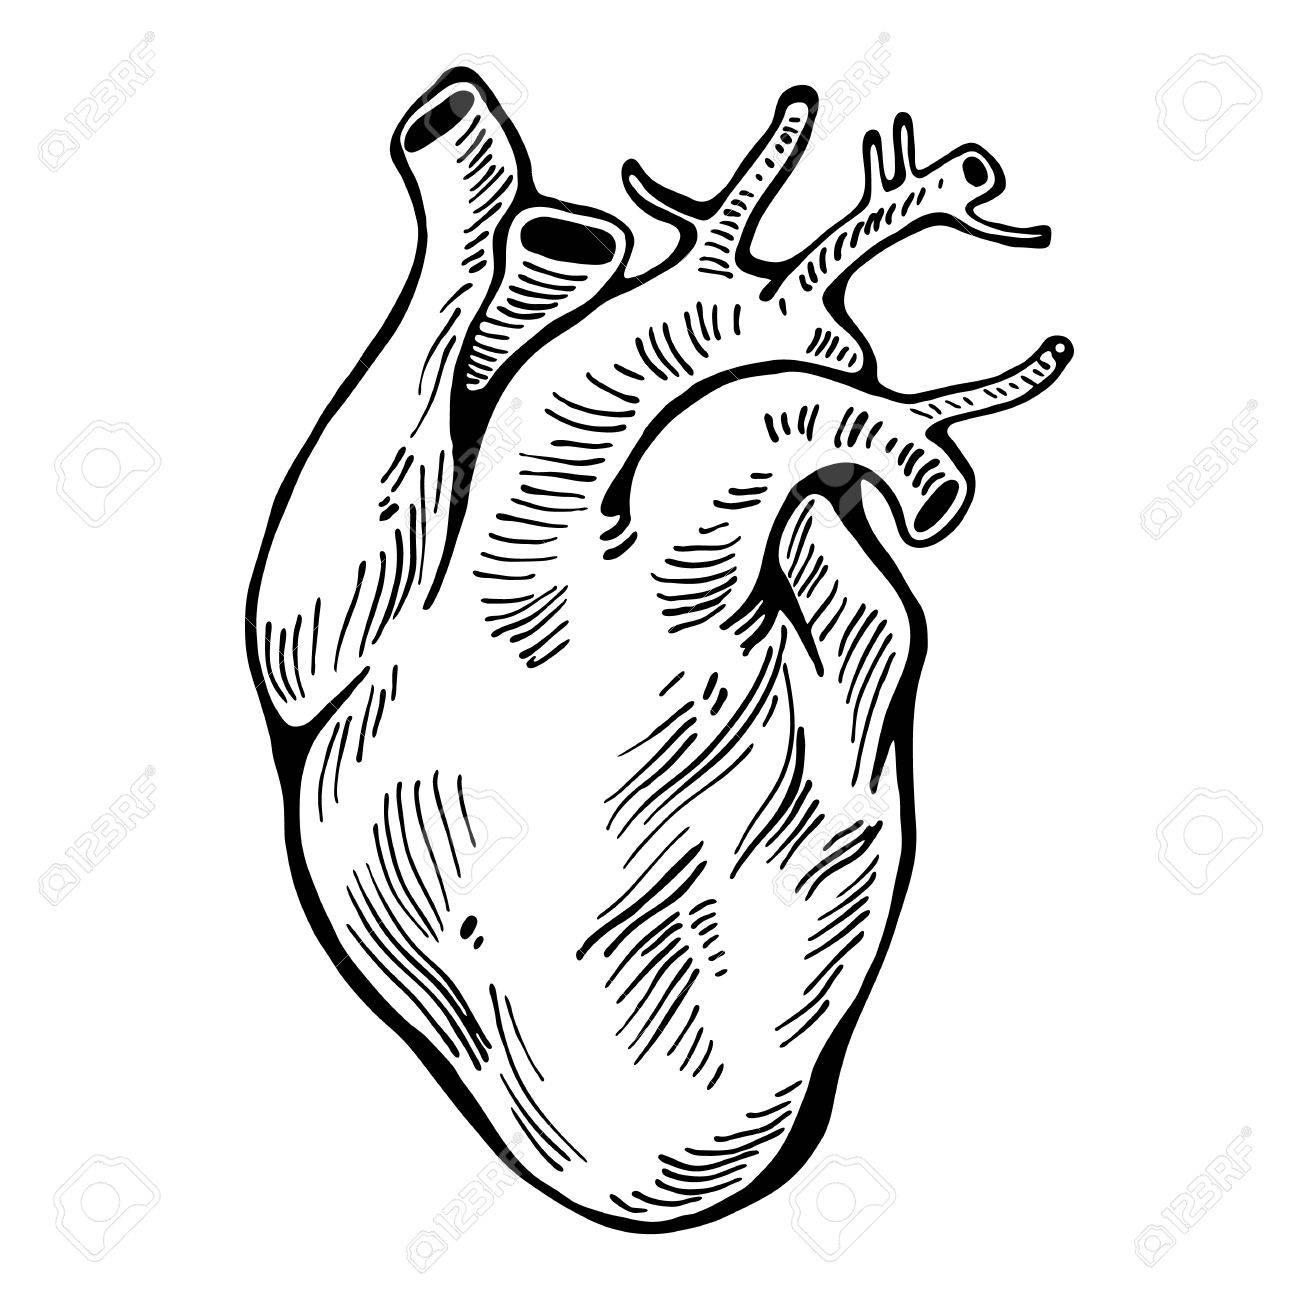 1300x1300 Human Heart Black Line, Tattoo, Organ Vector Illustration Royalty